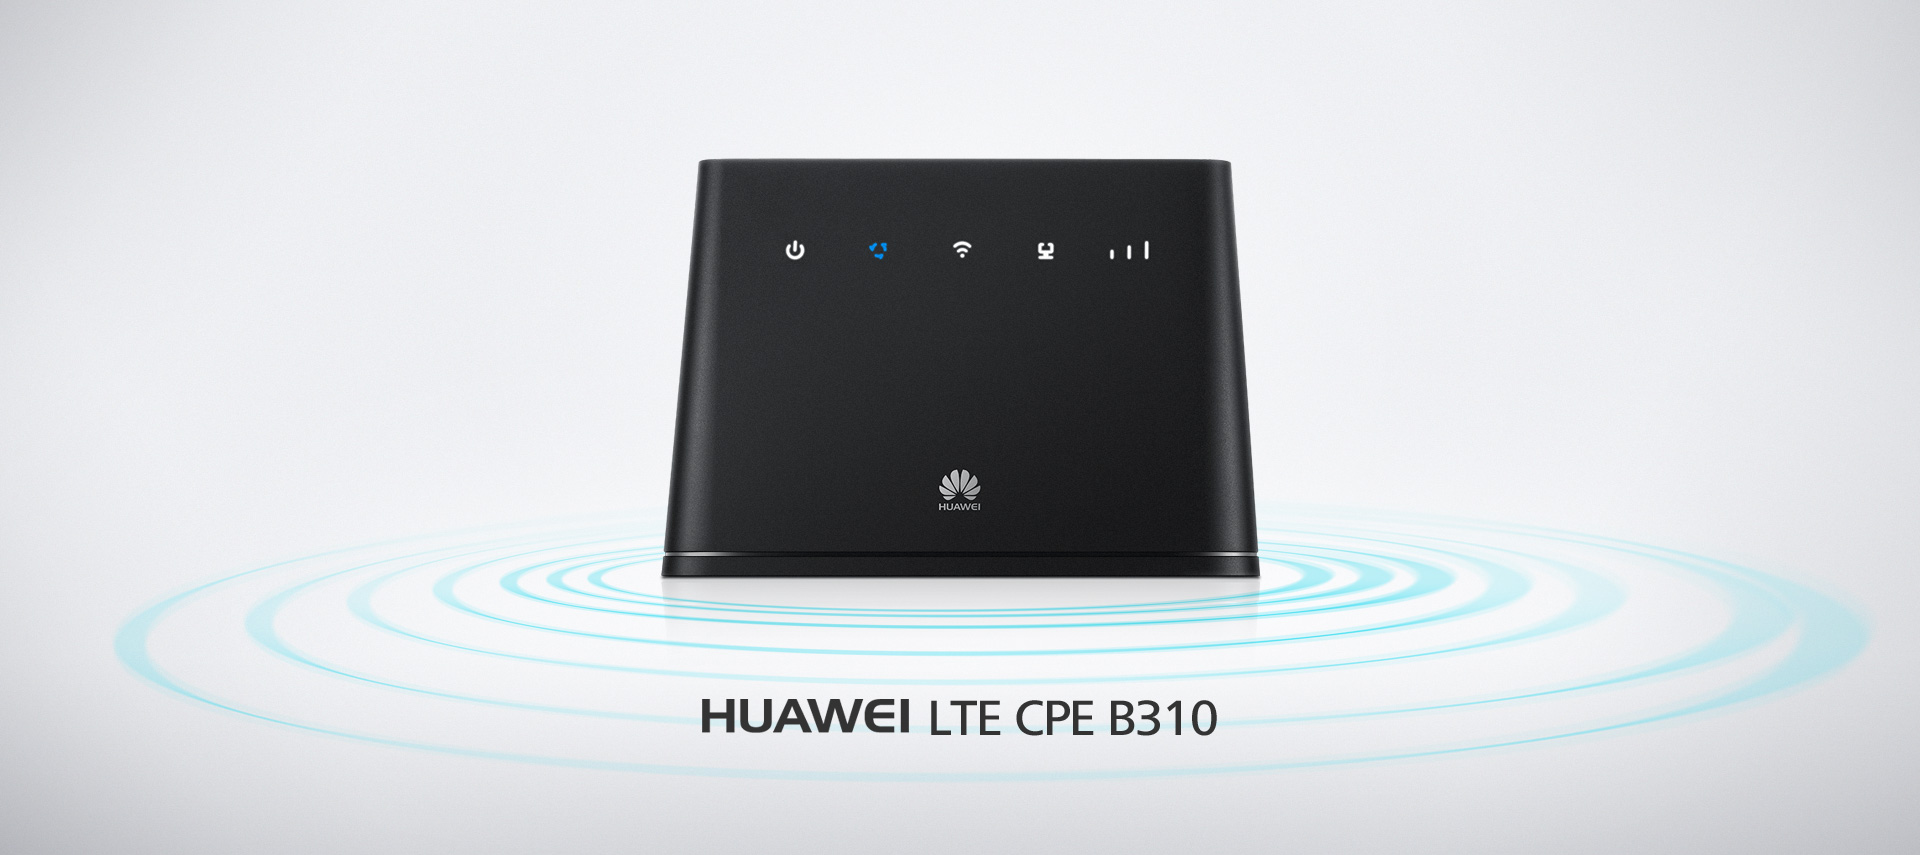 HUAWEI LTE CPE B310 | Home Internet | HUAWEI Kenya